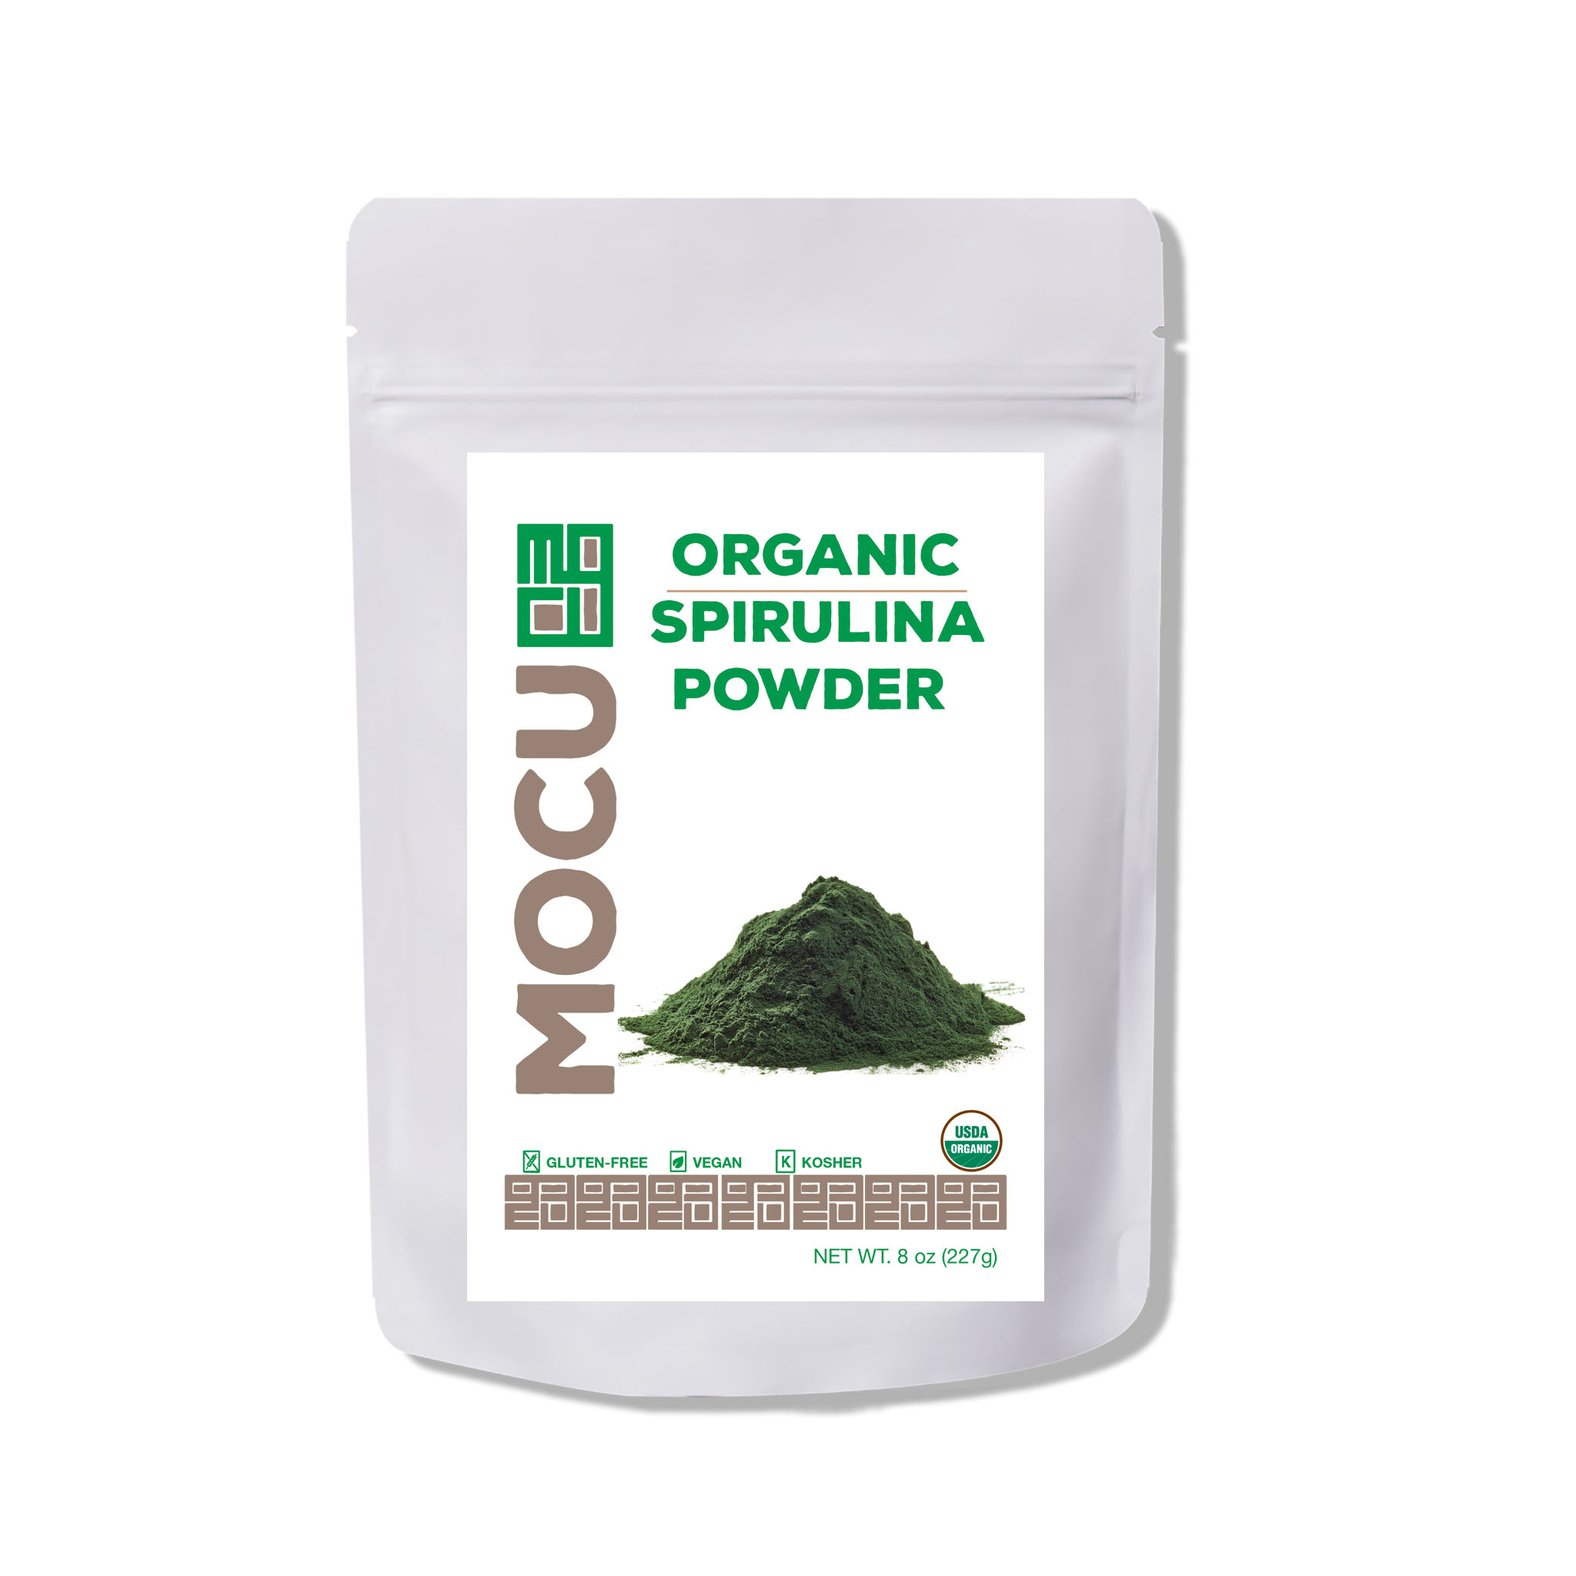 mocu-organic-spirulina-powder-front.jpg